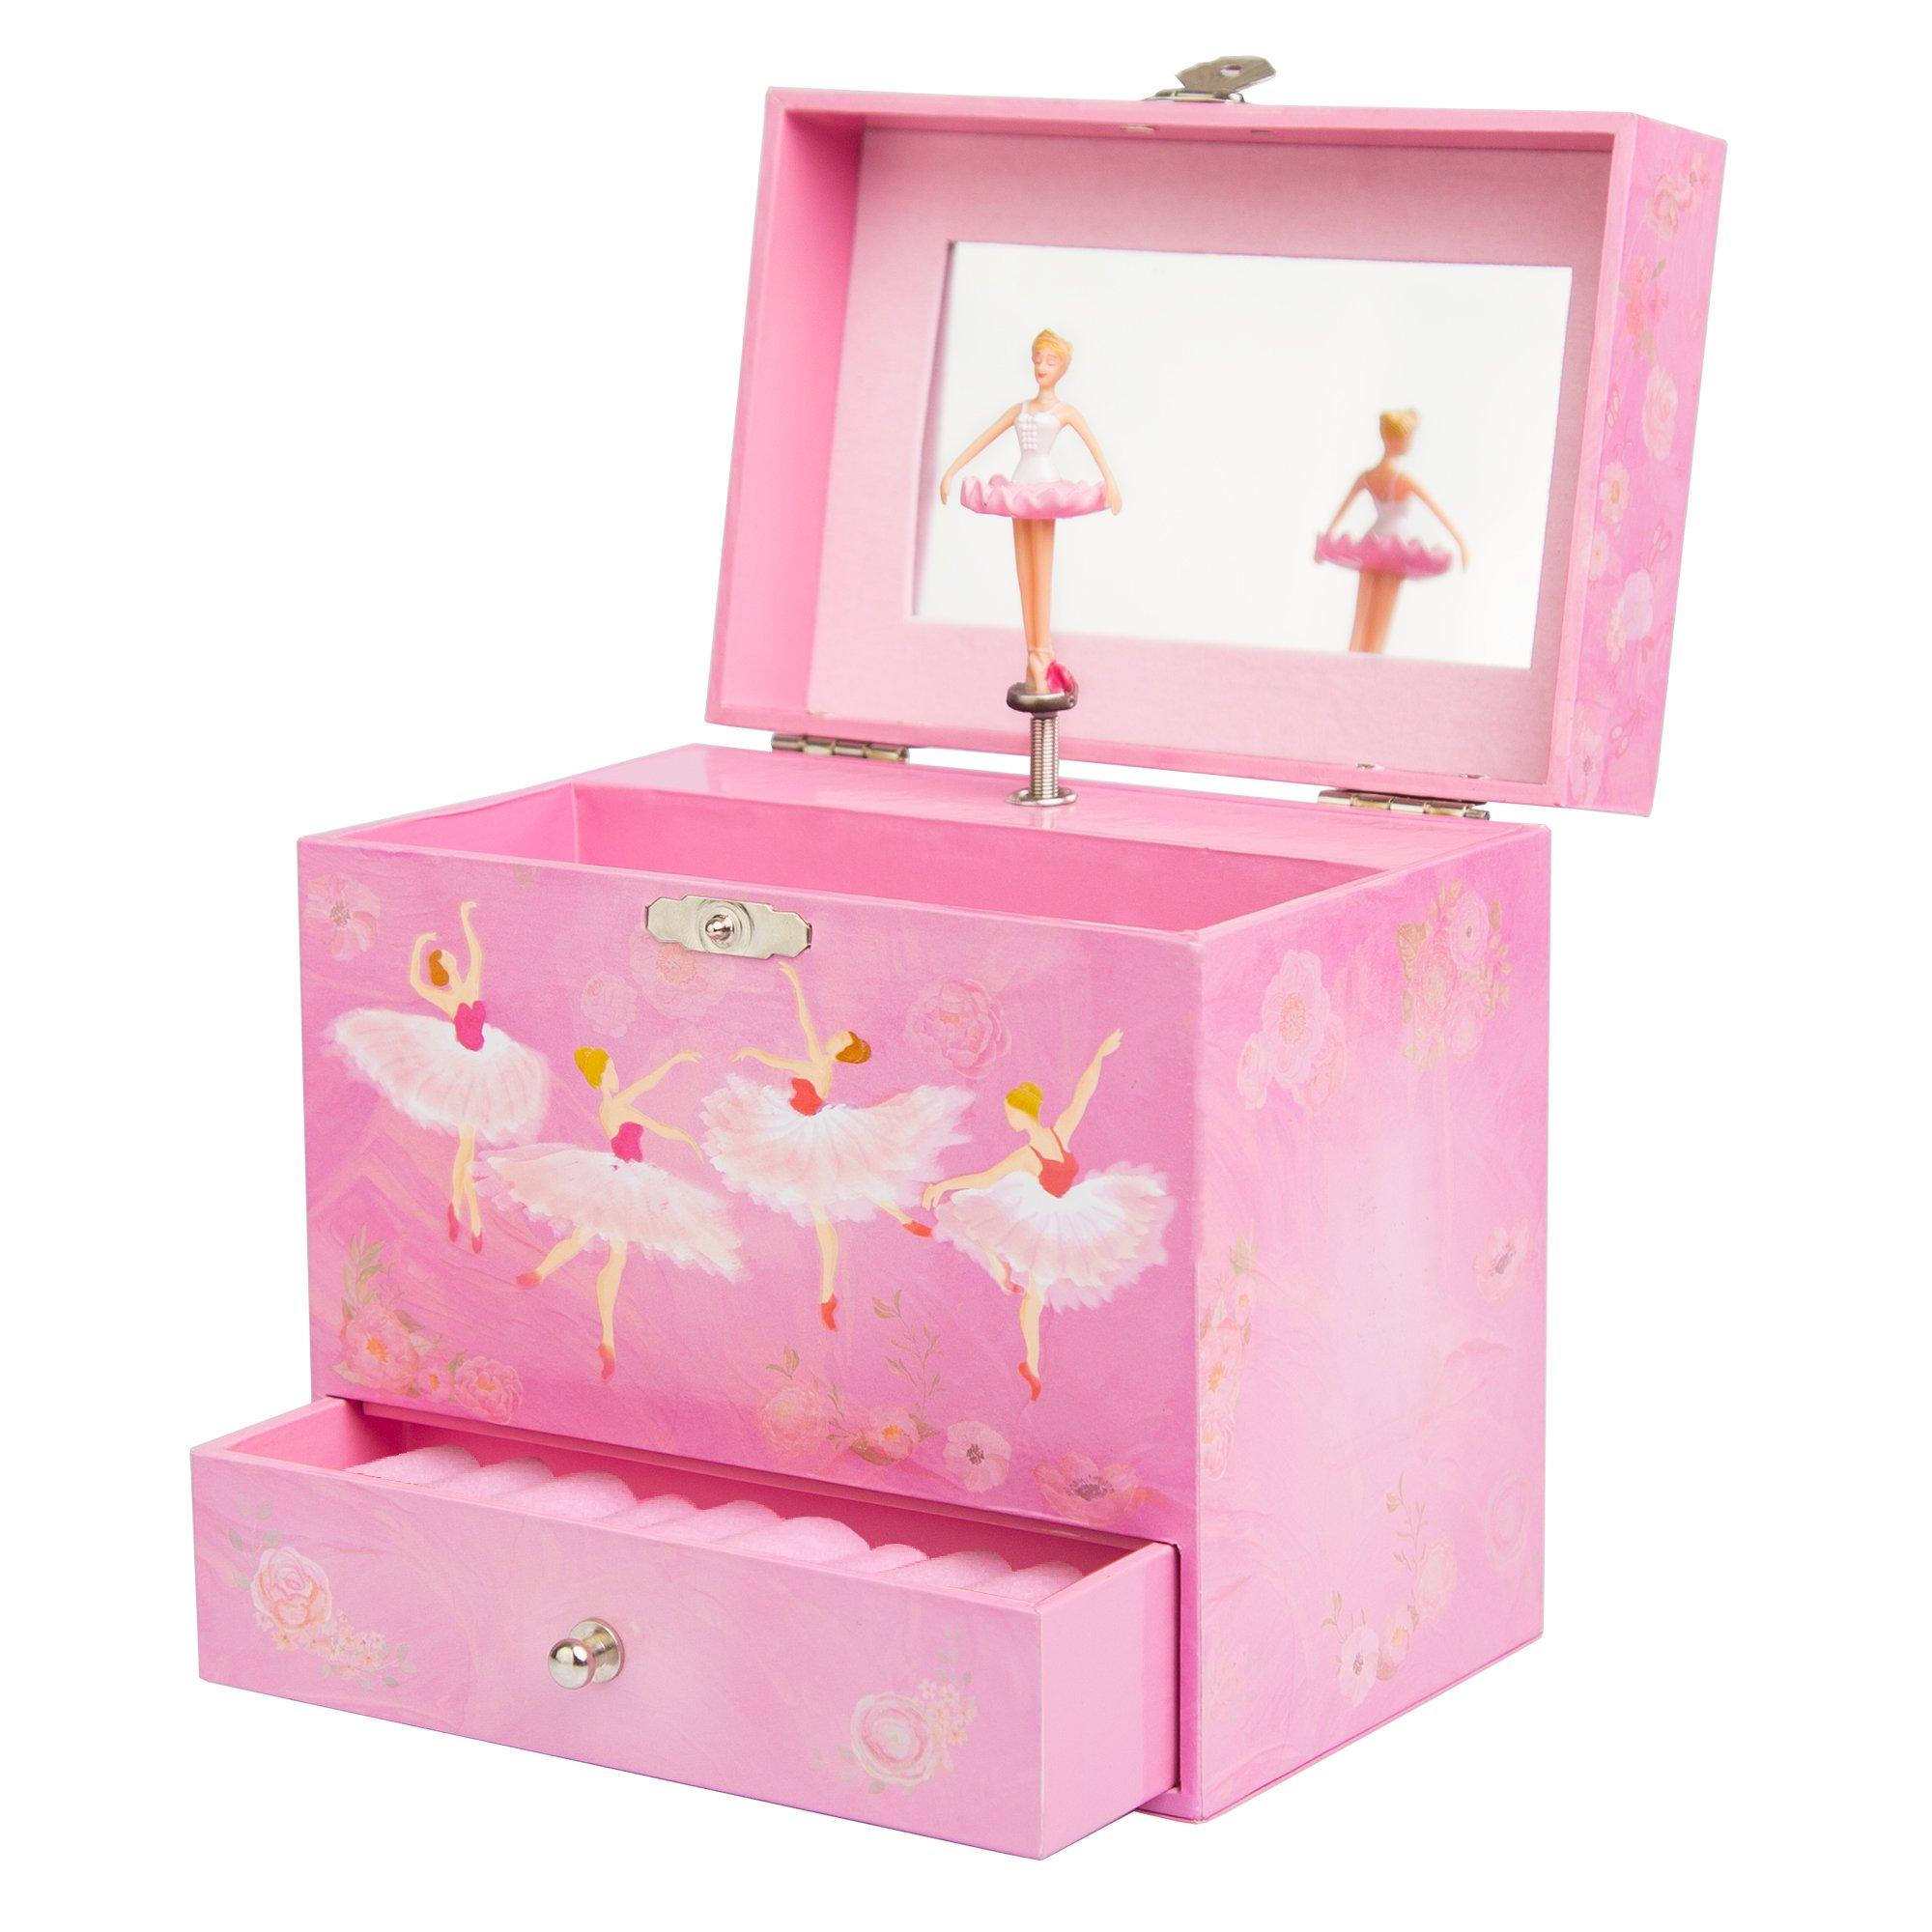 Play Platoon Ballerina Music Box for Girls - Ballet Dancer Jewelry Box